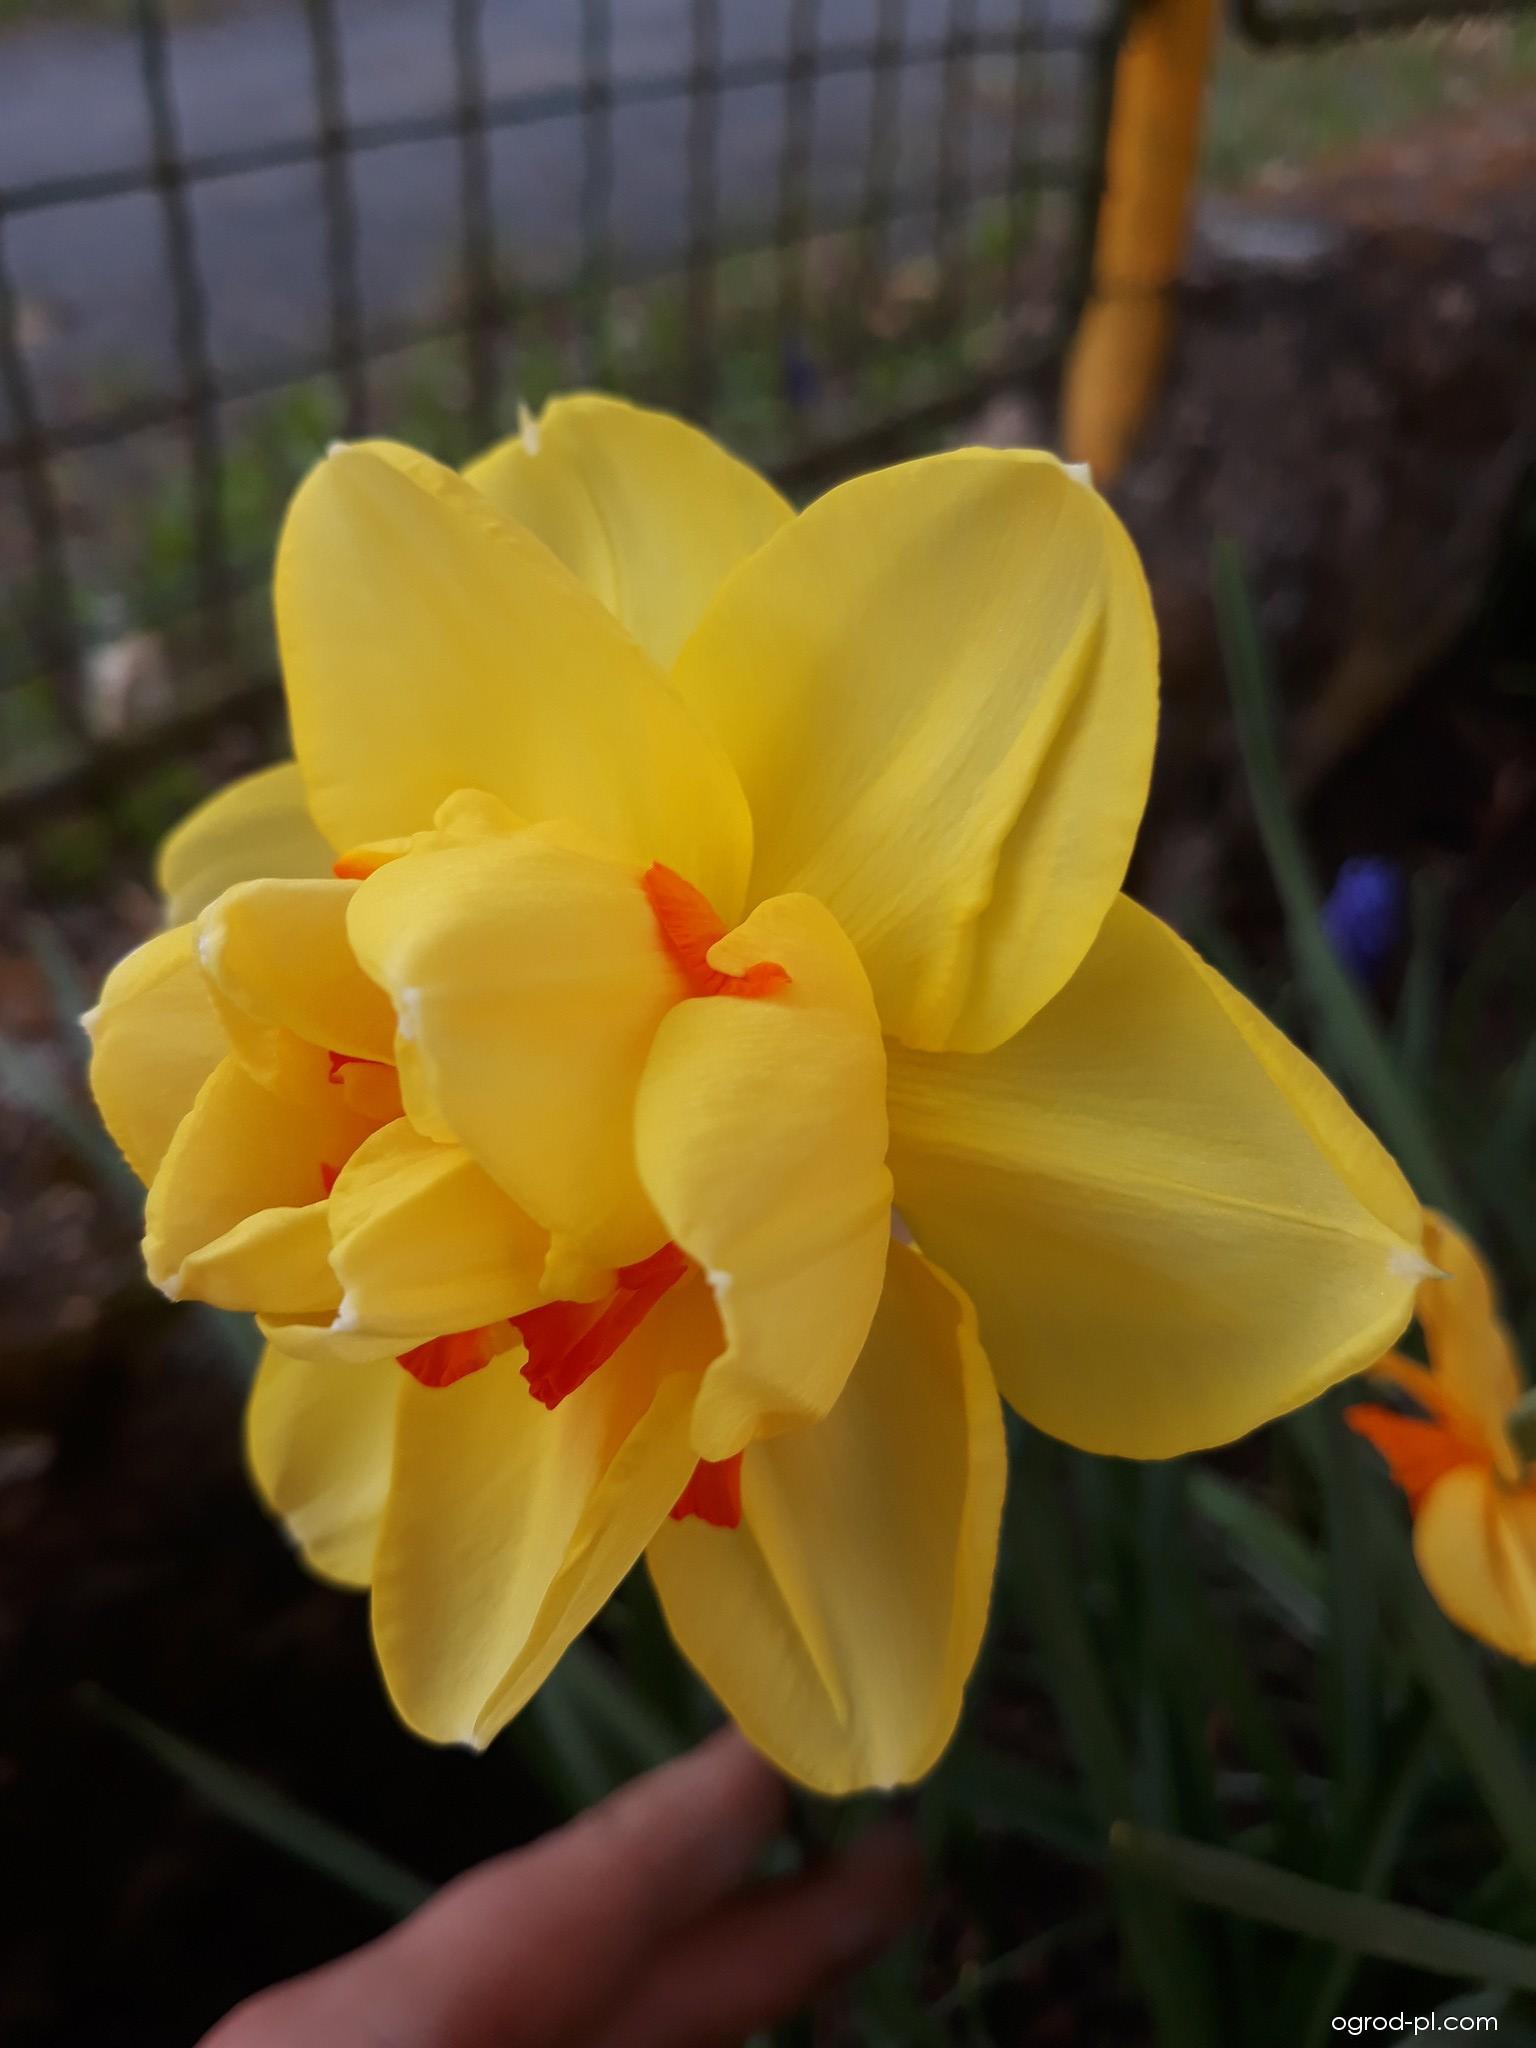 Narcis Tahiti - Plnokvěté narcisy (Narcissus x hybridus)